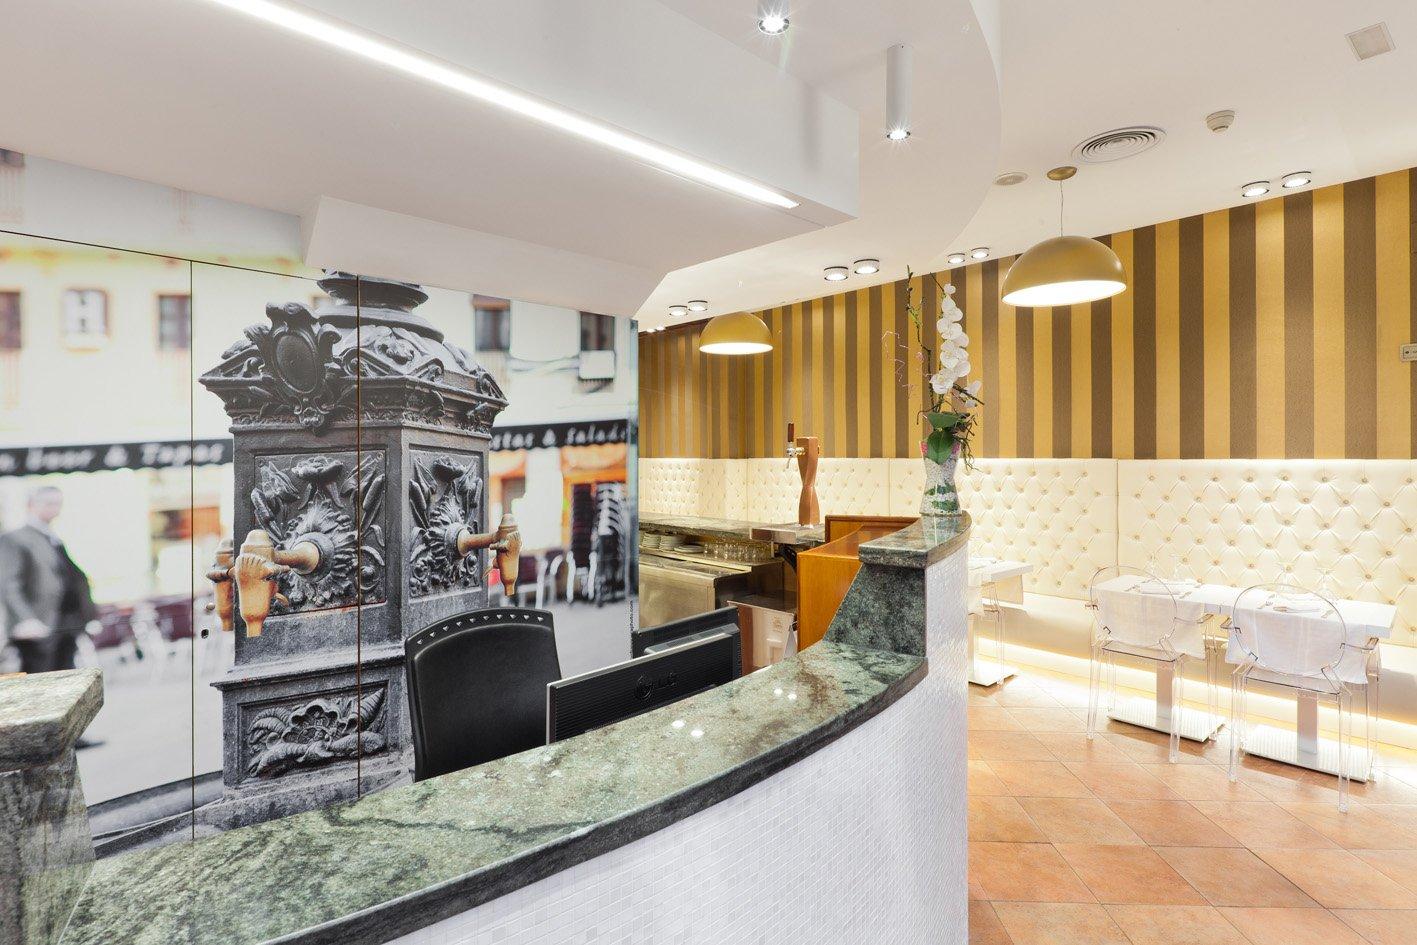 hotel_la_fontnombre_del_documento_29-23d28afc3c3451c10605beafd2649ee3